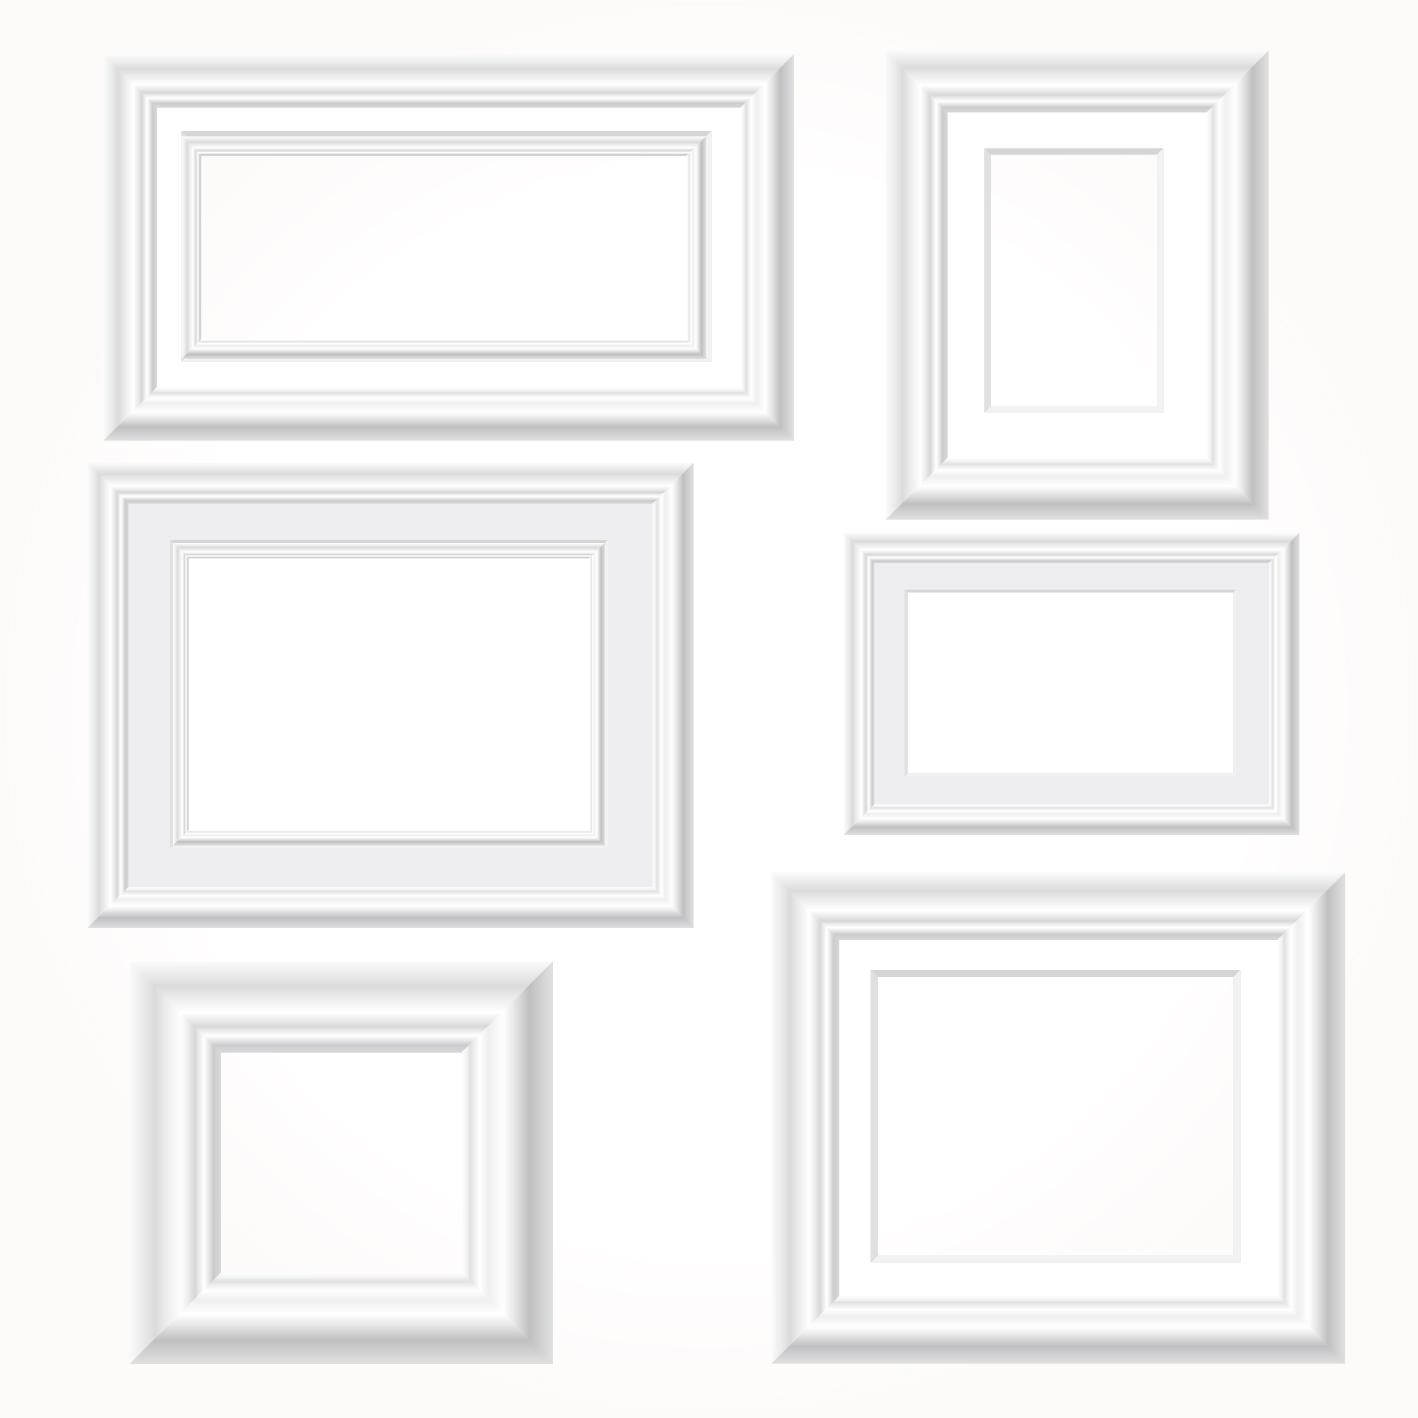 http://freedesignfile.com/upload/2015/08/White-photo-frames-vector ...